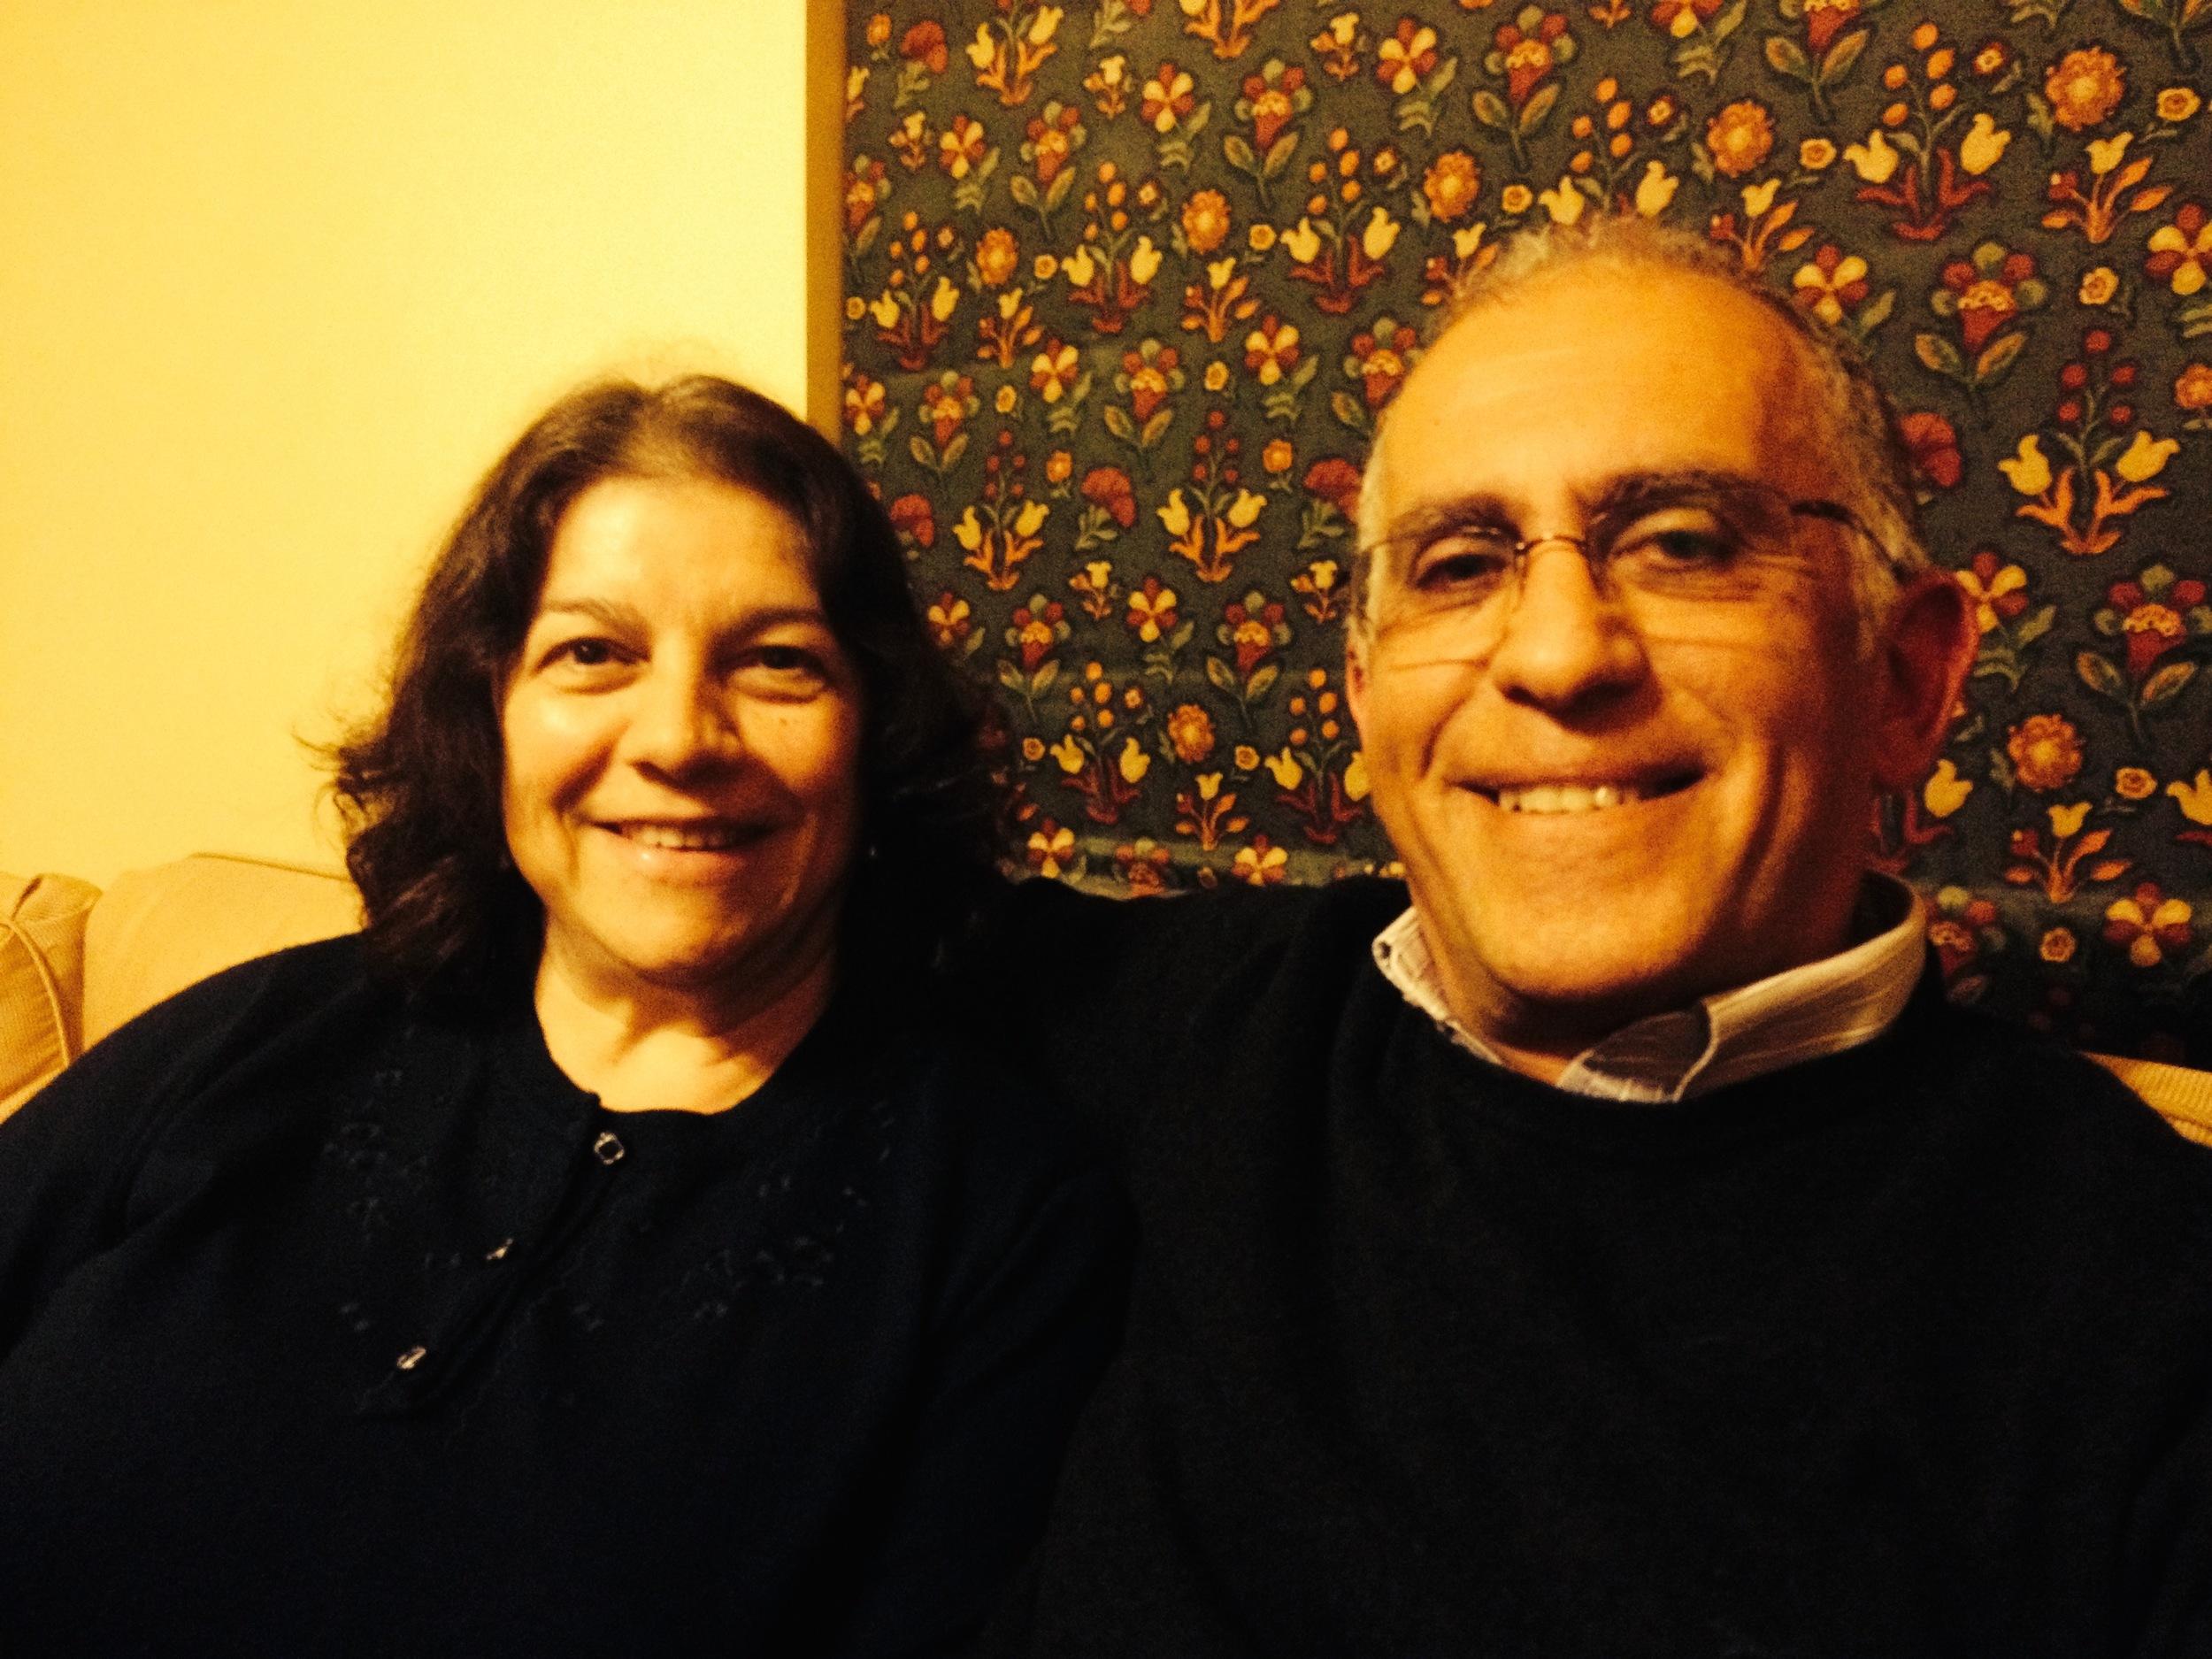 Cathy & Xenophon